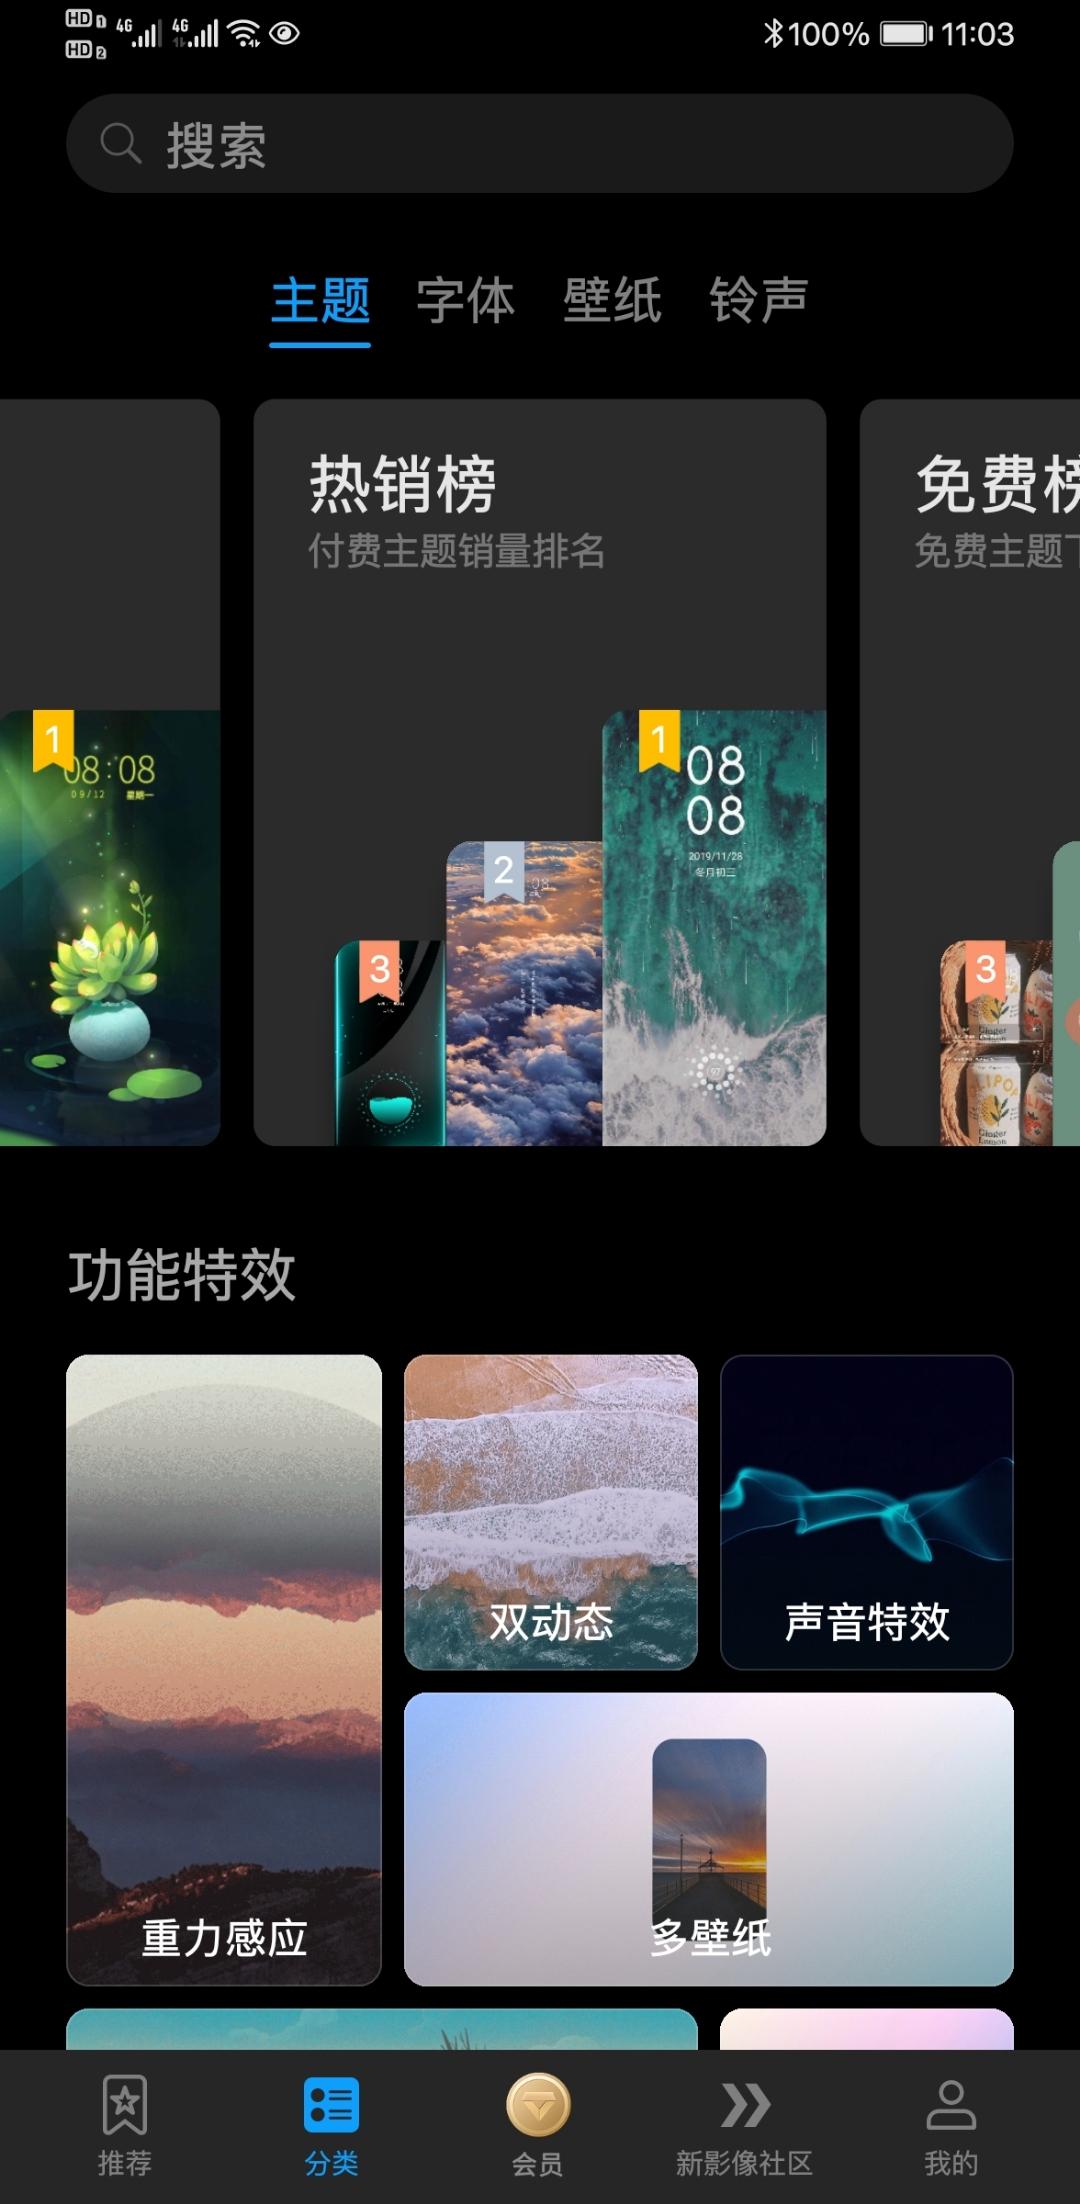 Screenshot_20200517_230342_com.huawei.android.thememanager.jpg